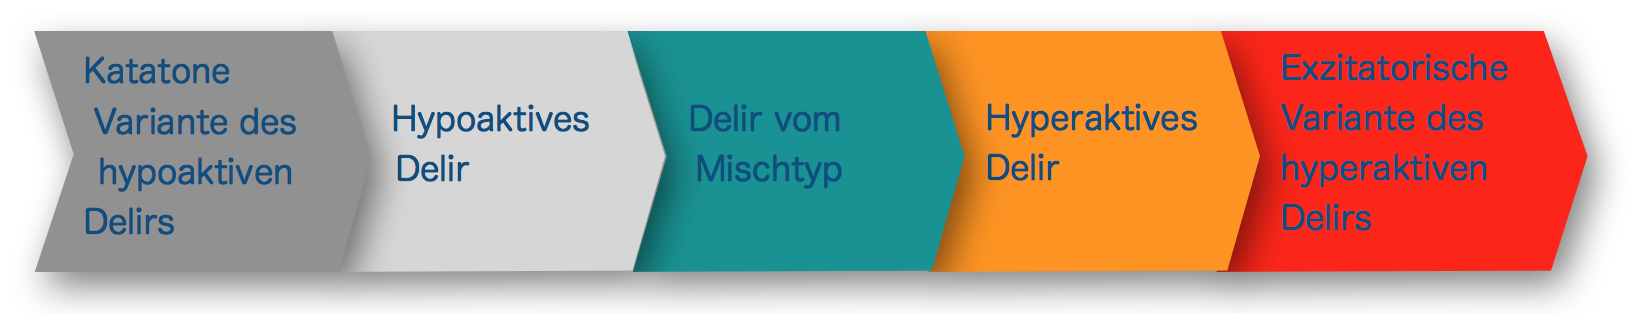 Delirklassifikation Blogpost 2019 06 16 16 00 38